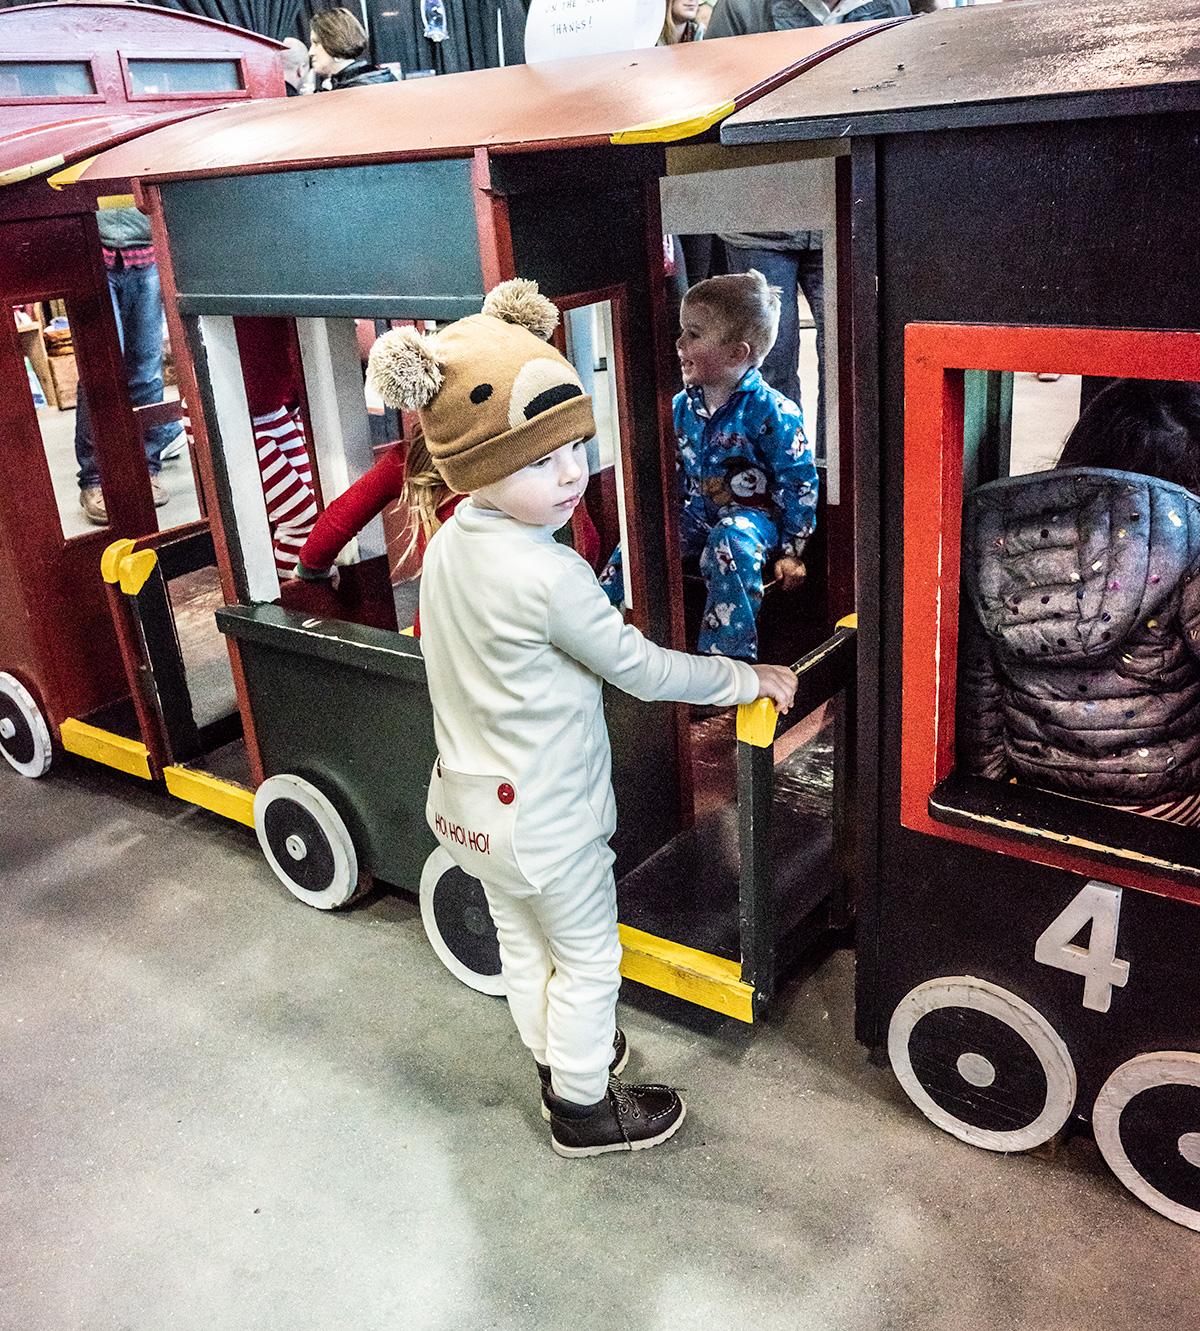 Tru-rides-Polar-Express